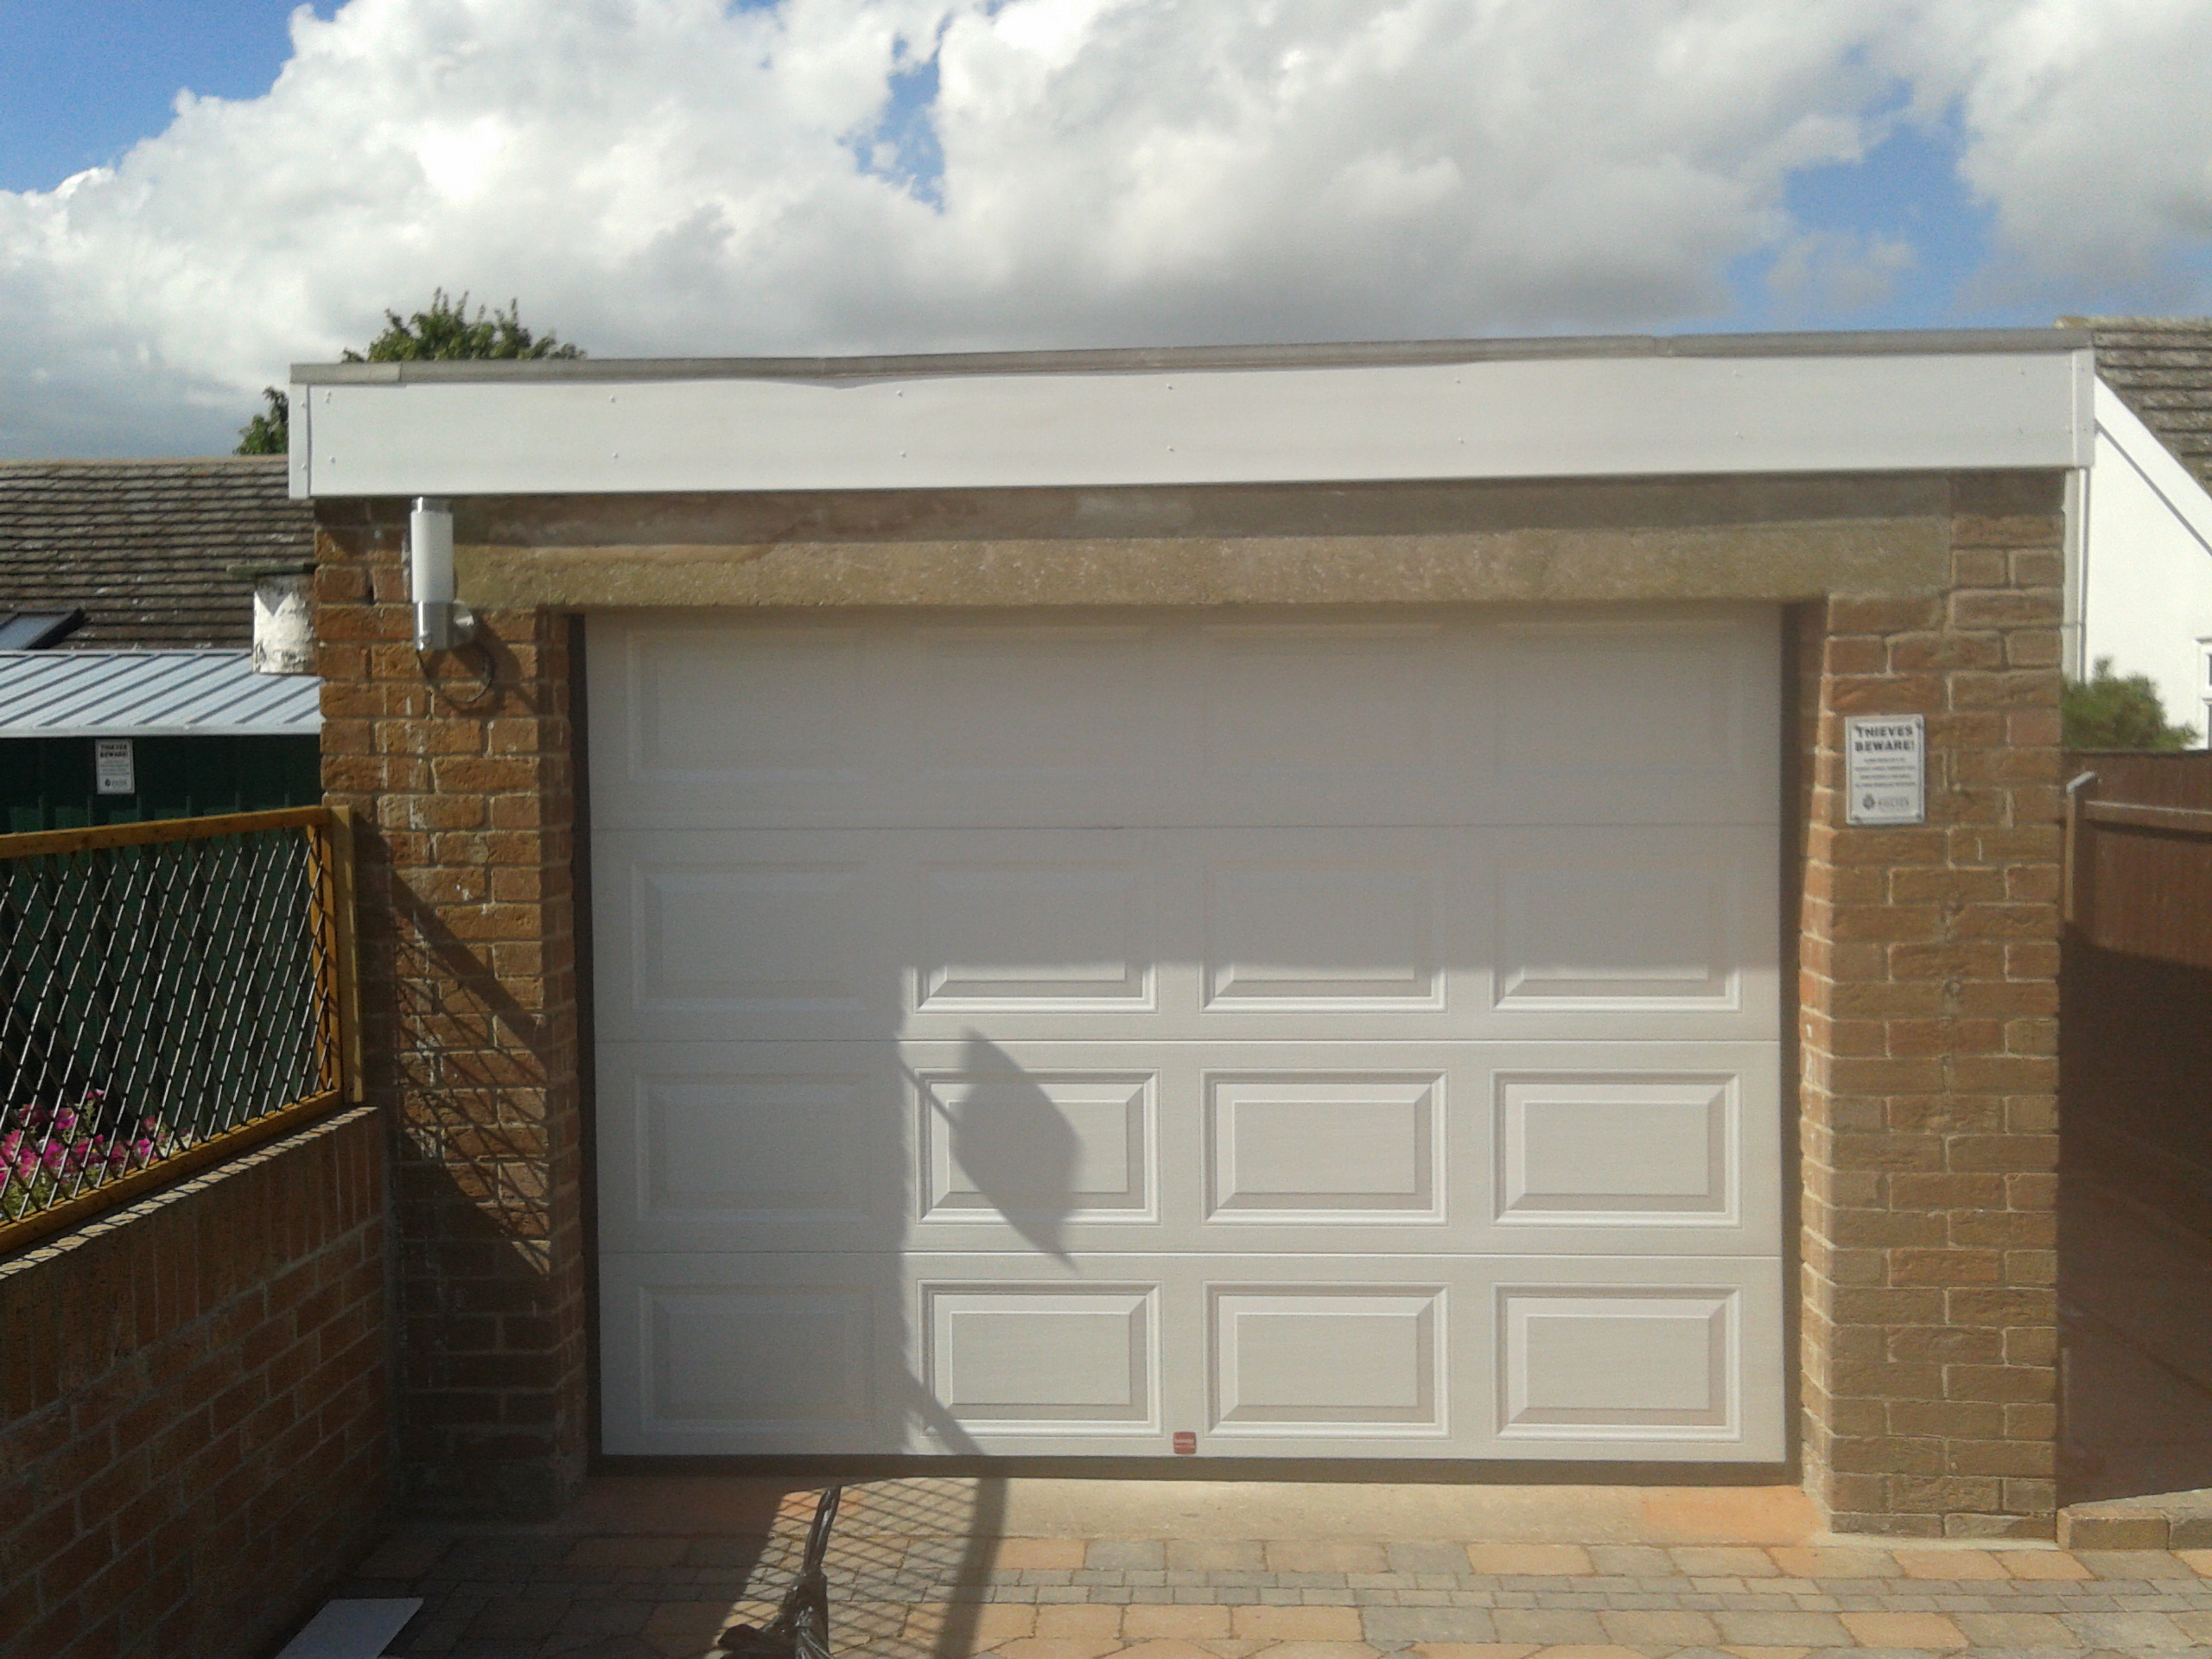 1920 #446487 Sectional Garage Doors Maximise Opening – Garage Door Company  save image Garage Sectional Doors 37072560